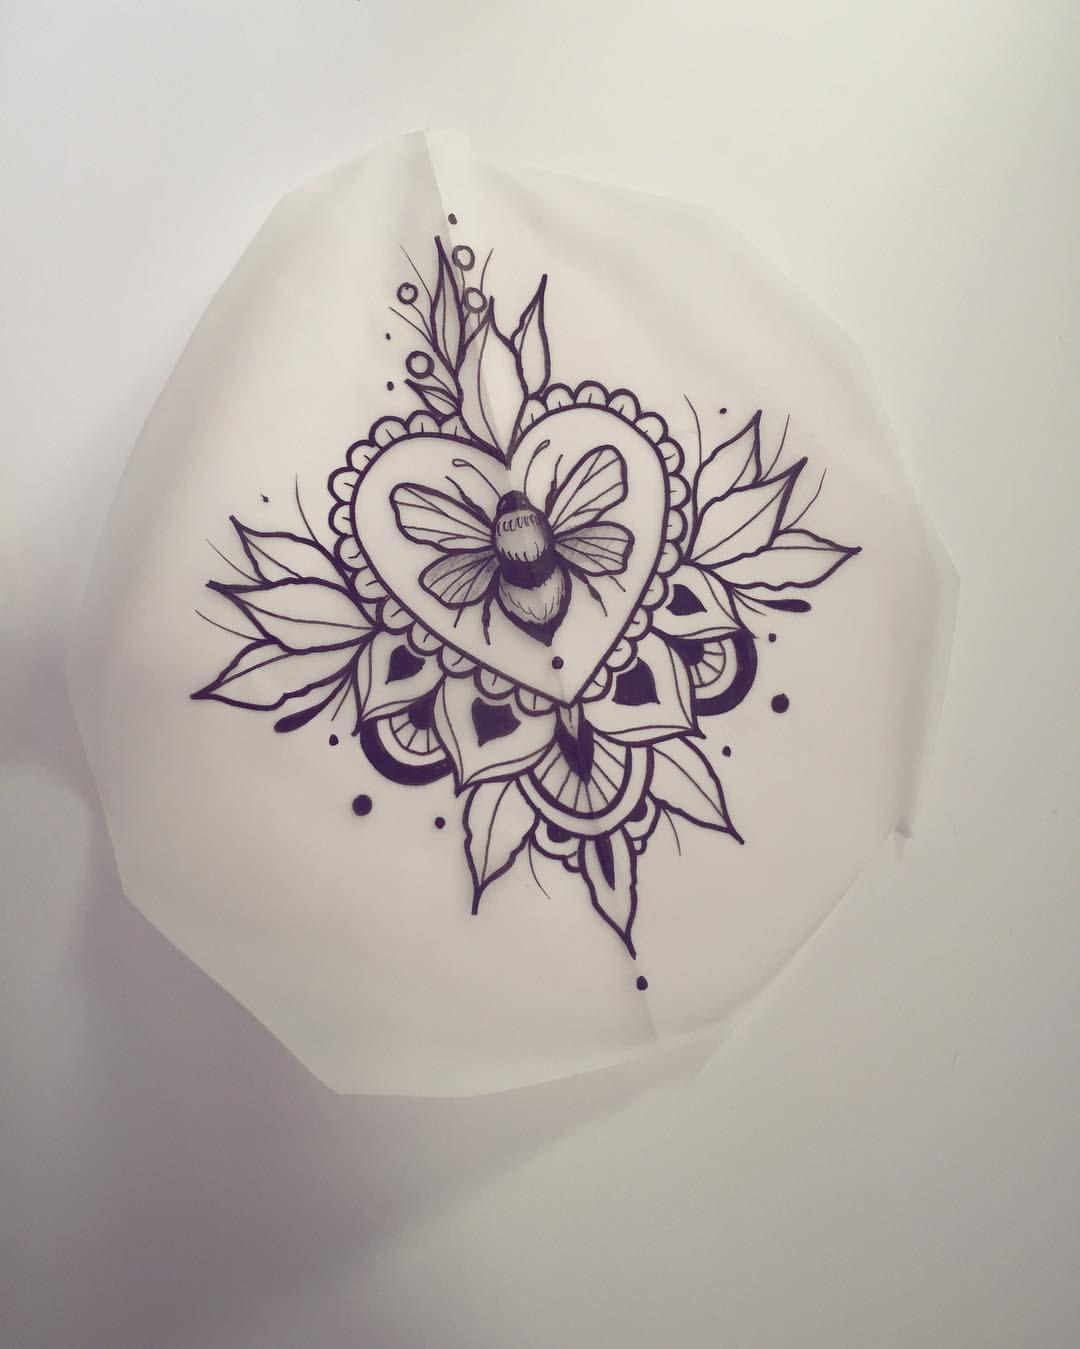 Paw Print In The Middle Tattoos Pinterest Tatuajes Ideas De